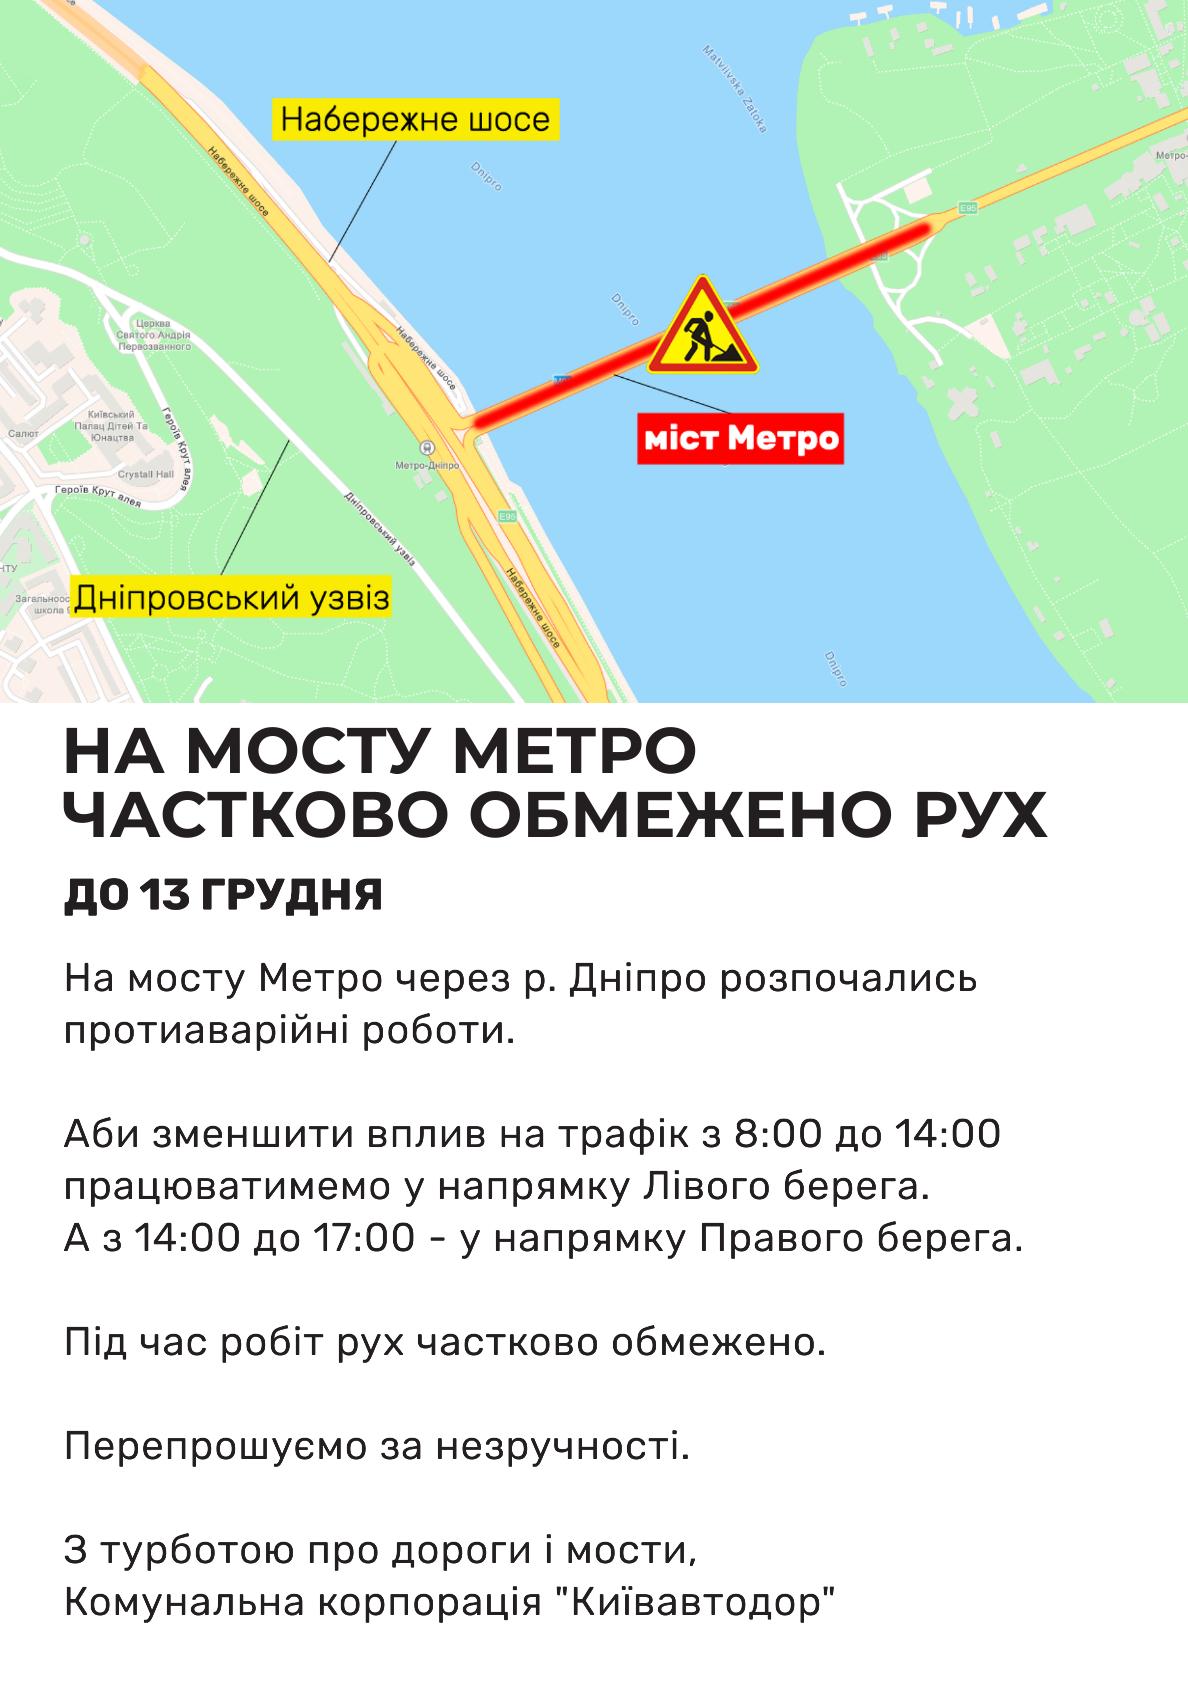 На мосту Метро частково обмежили рух - Міст метро, Київавтодор - 128995451 1616804815169059 5167467812377737317 o